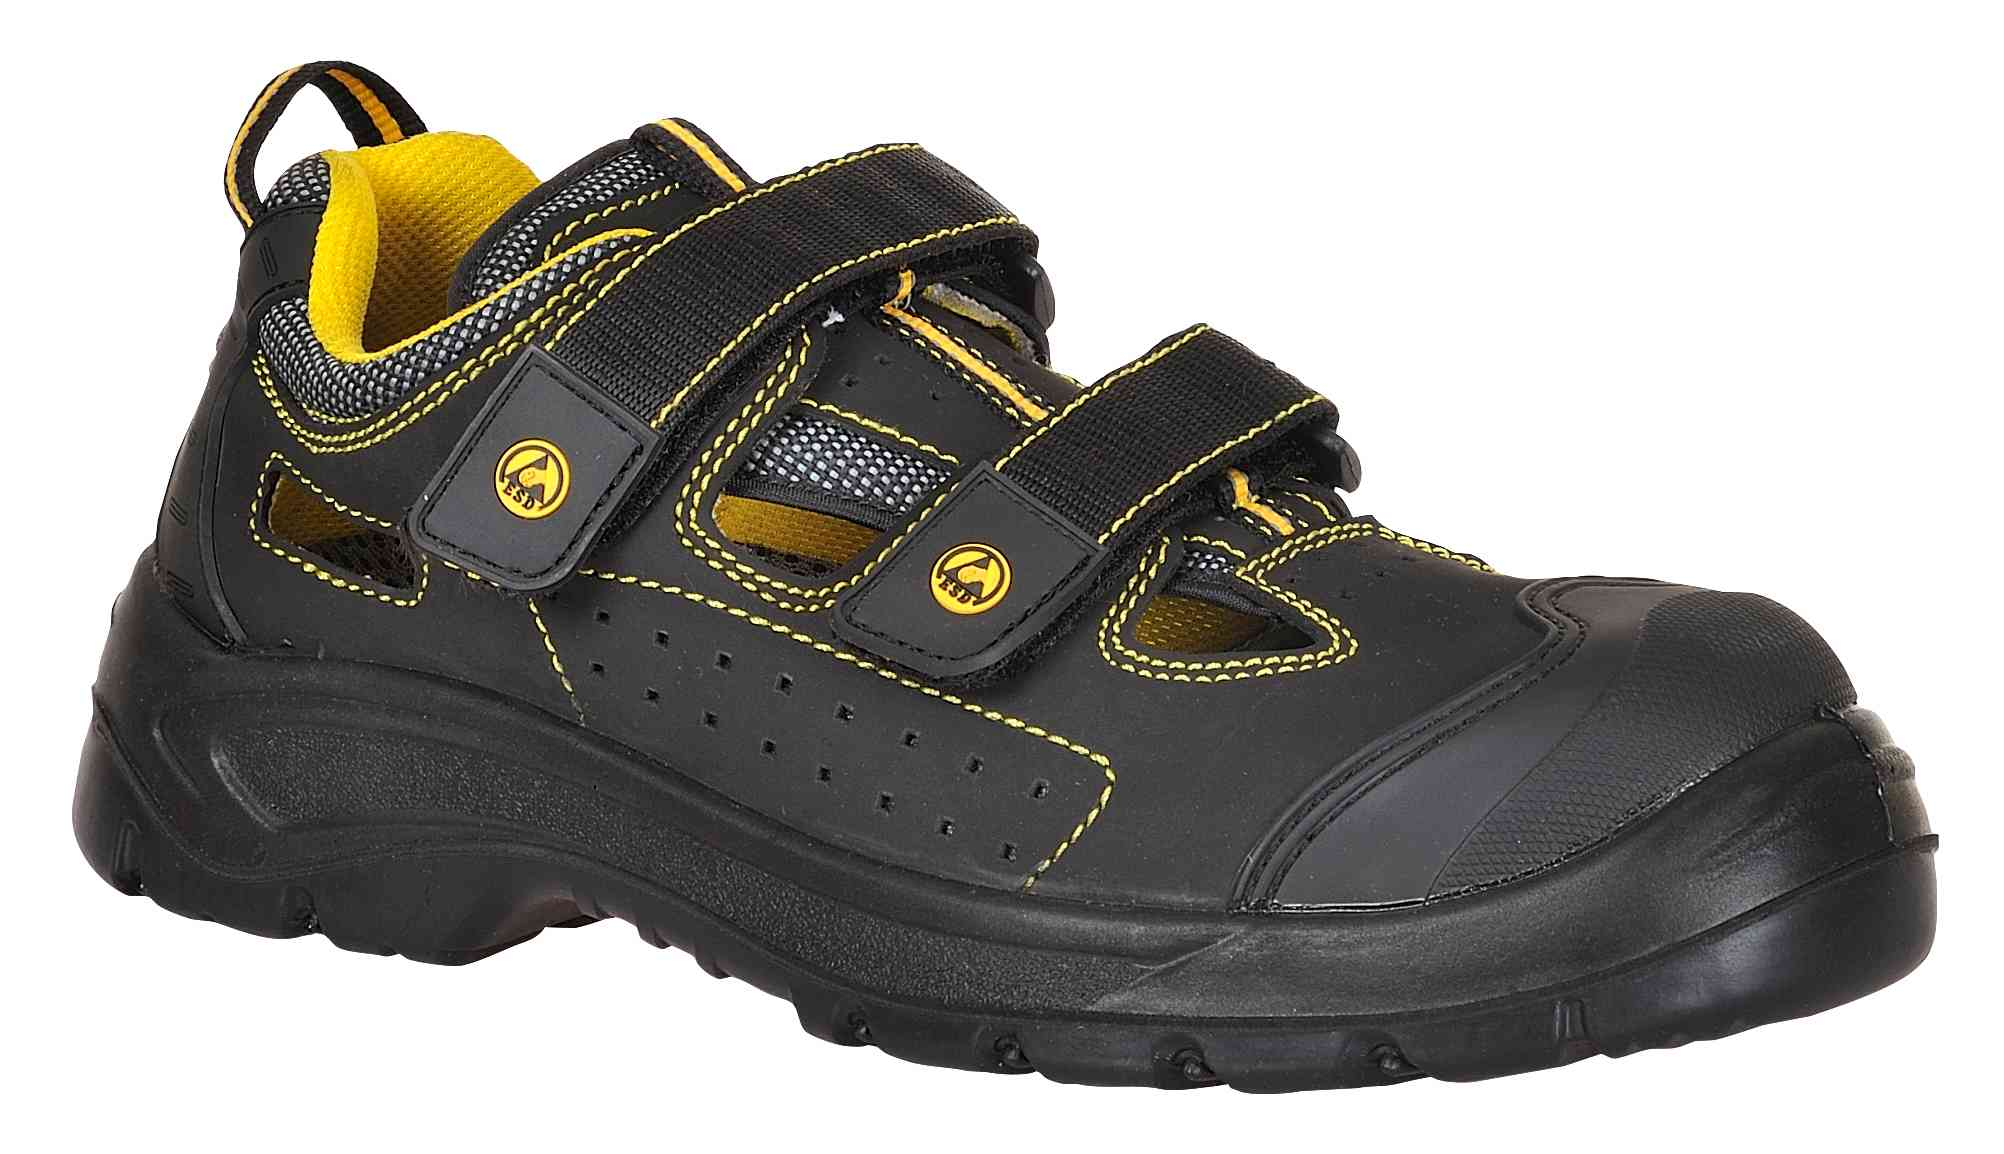 Portwest FC03 Tagus Safety Sandal Slip-On ESD Metal Free